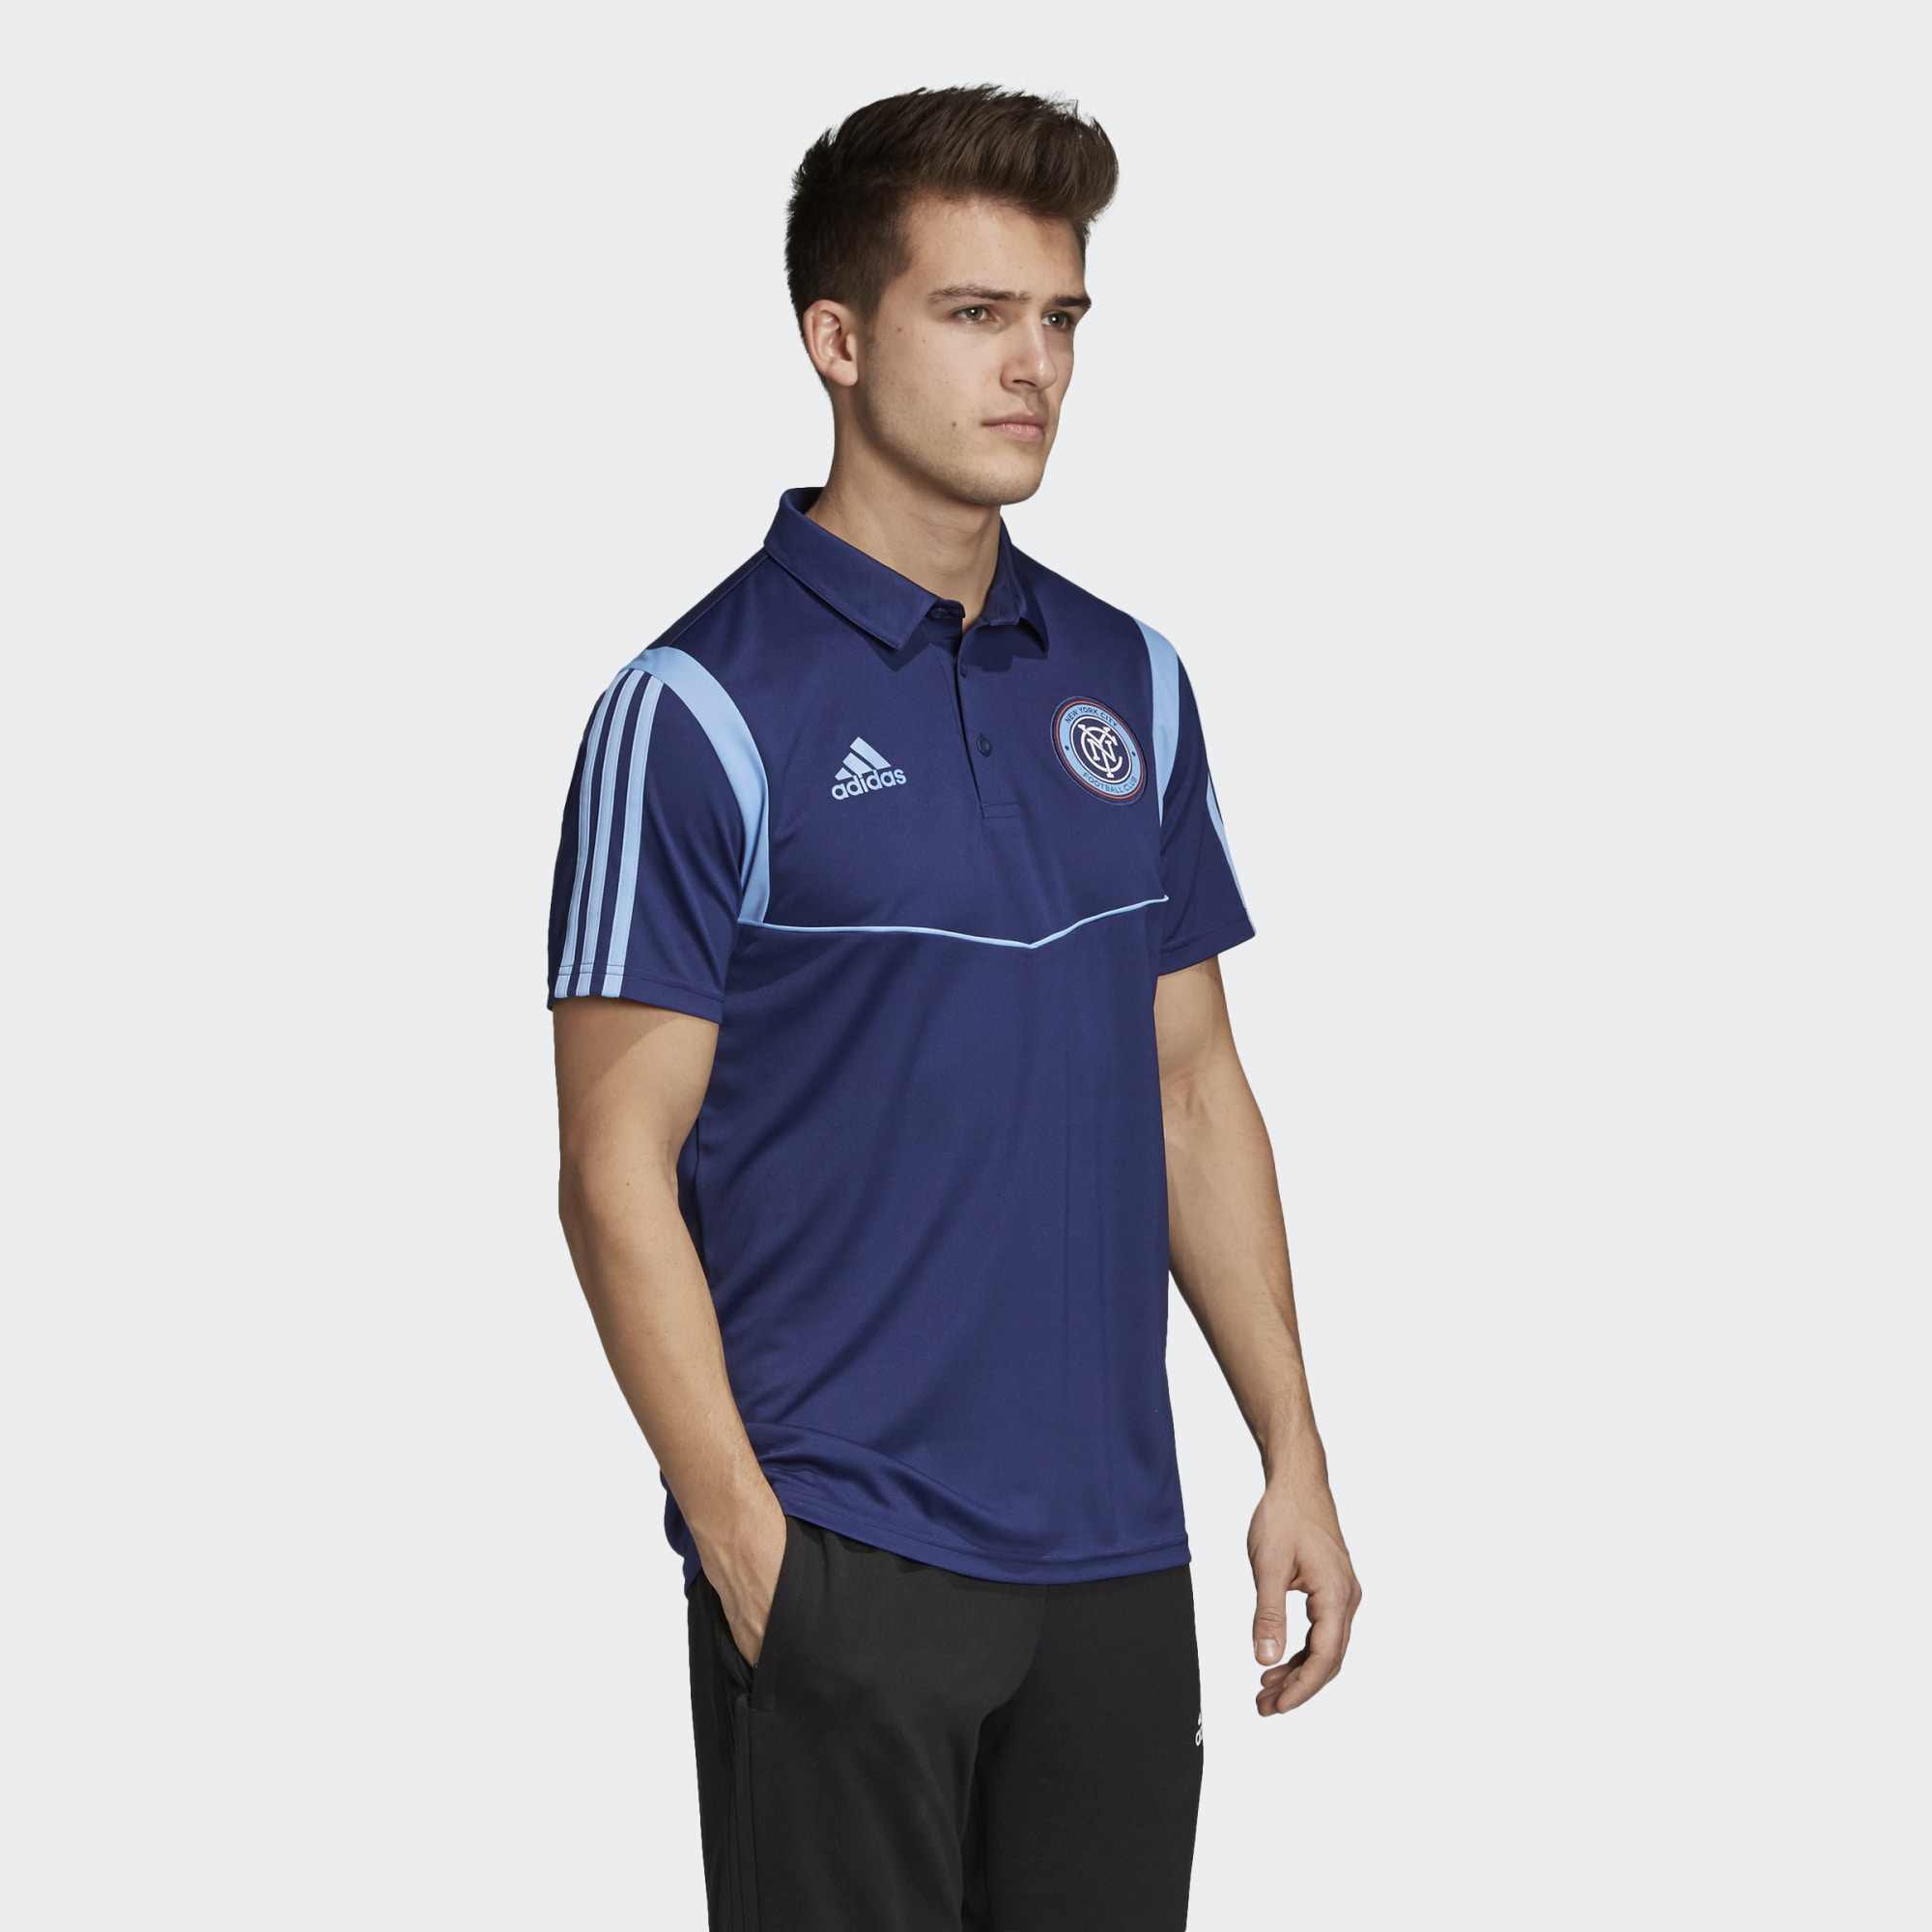 23616775188 ... Click to enlarge image  adidas 2019 new york city fc polo shirt night sky bahia light blue 3.jpg ...